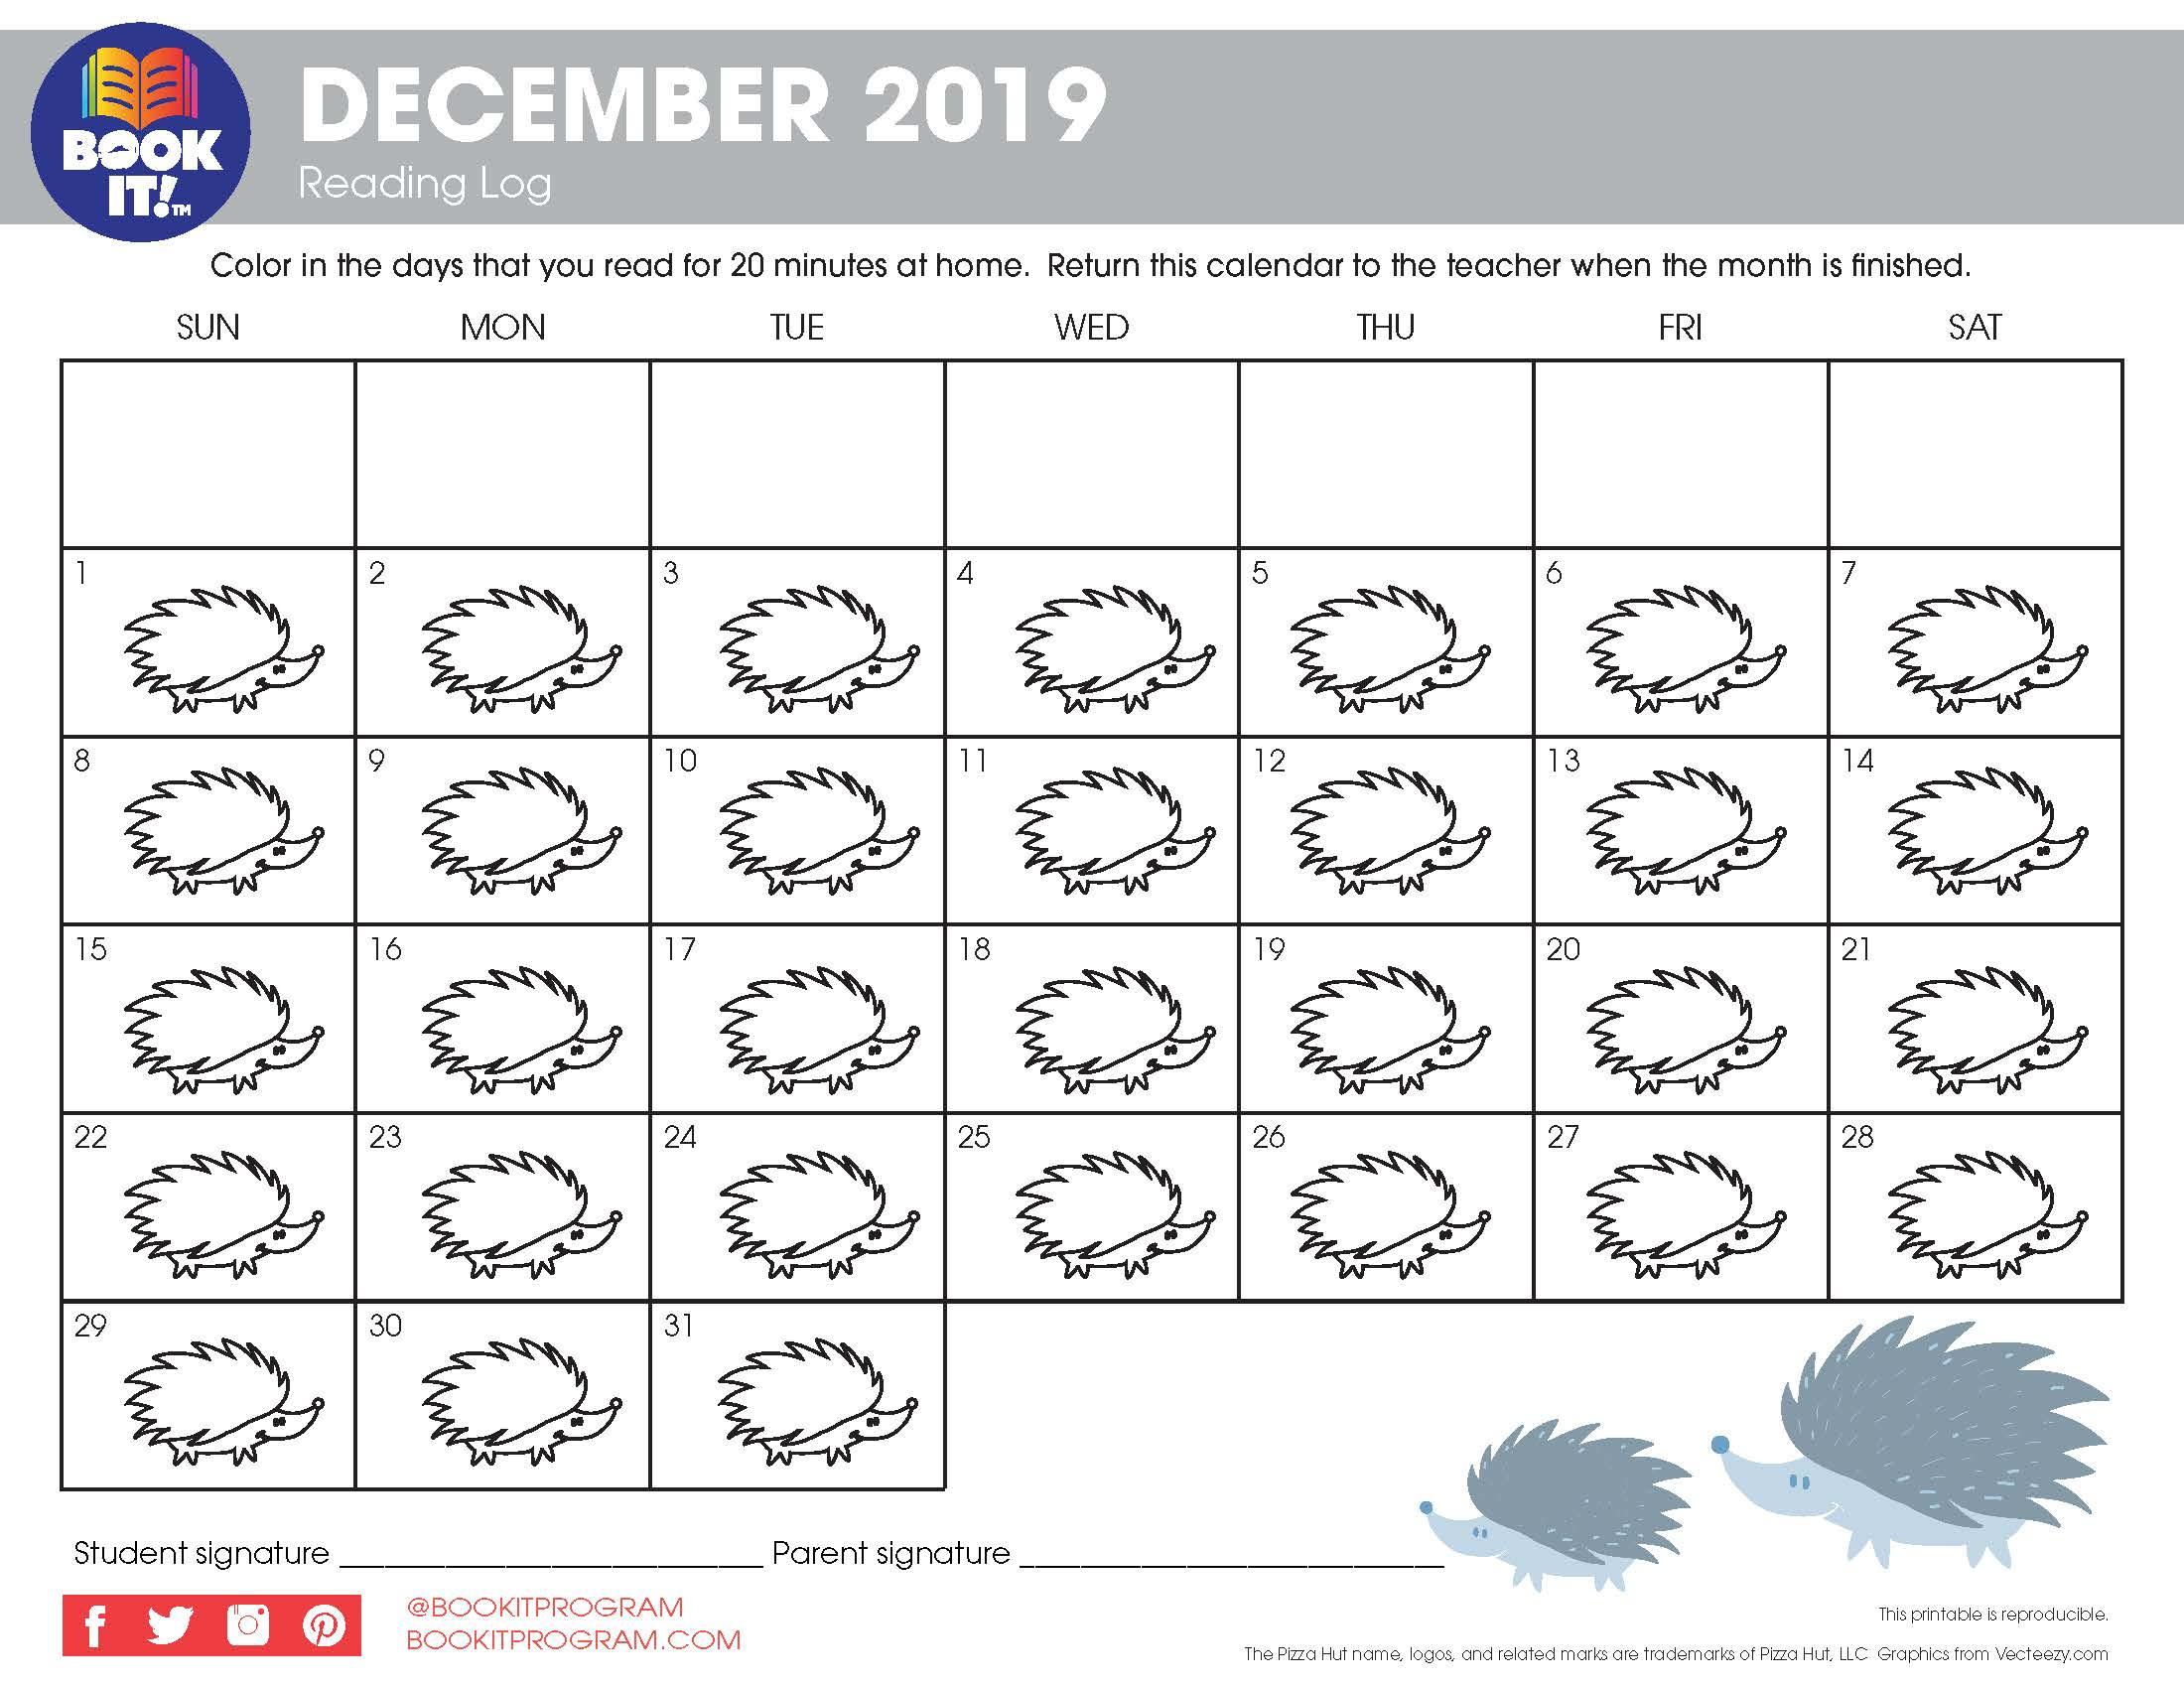 December Tracking Calendar Animal | The Pizza Hut Book It Pertaining To Pizza Hut Book It Calendar